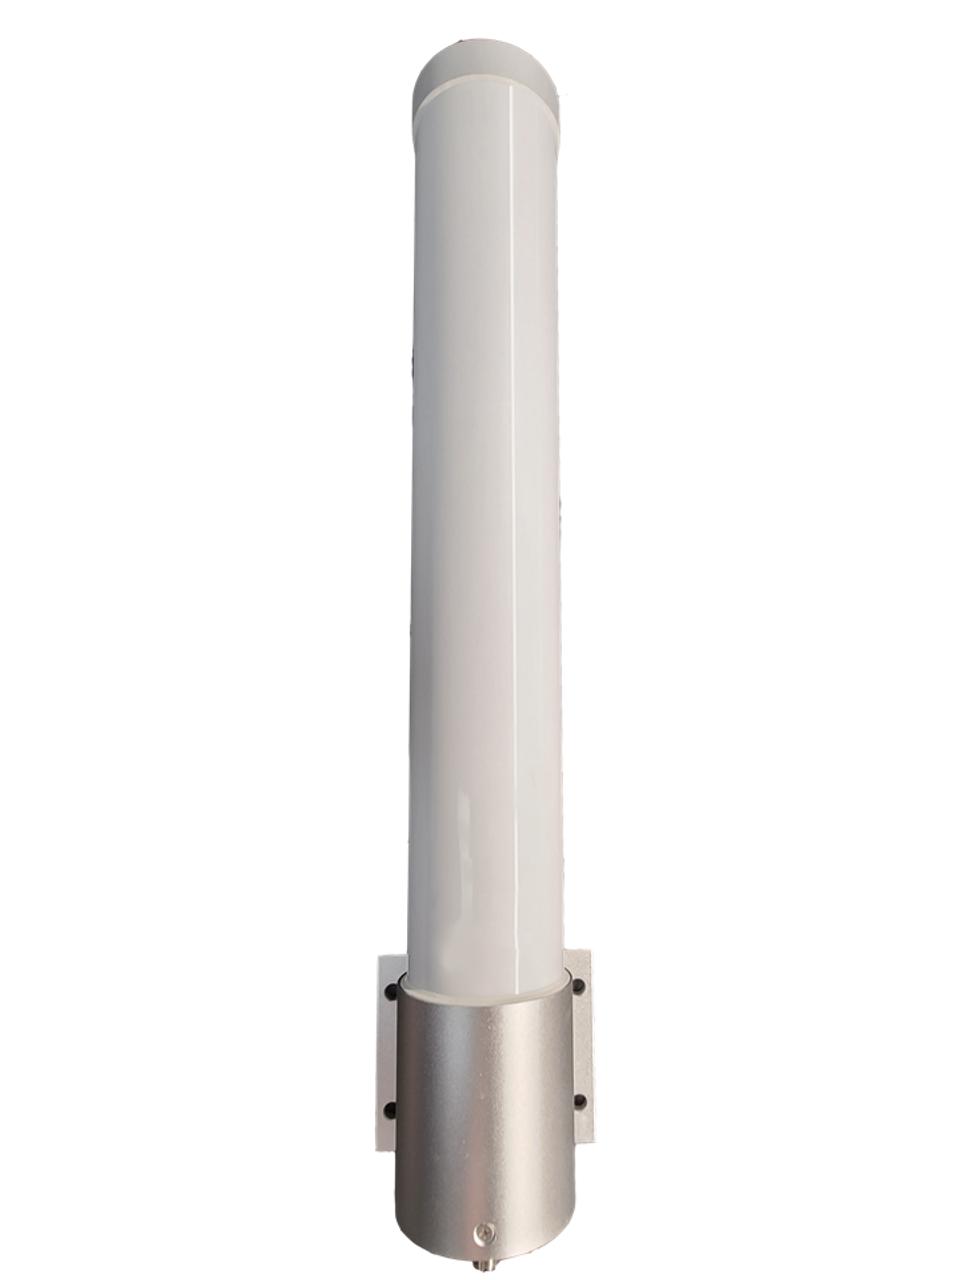 M25 Omni Directional Cellular 4G 5G LTE Antenna for NETGEAR NIGHTHAWK AX4 w/Bracket Mount - N Female w/ Cable Length Options